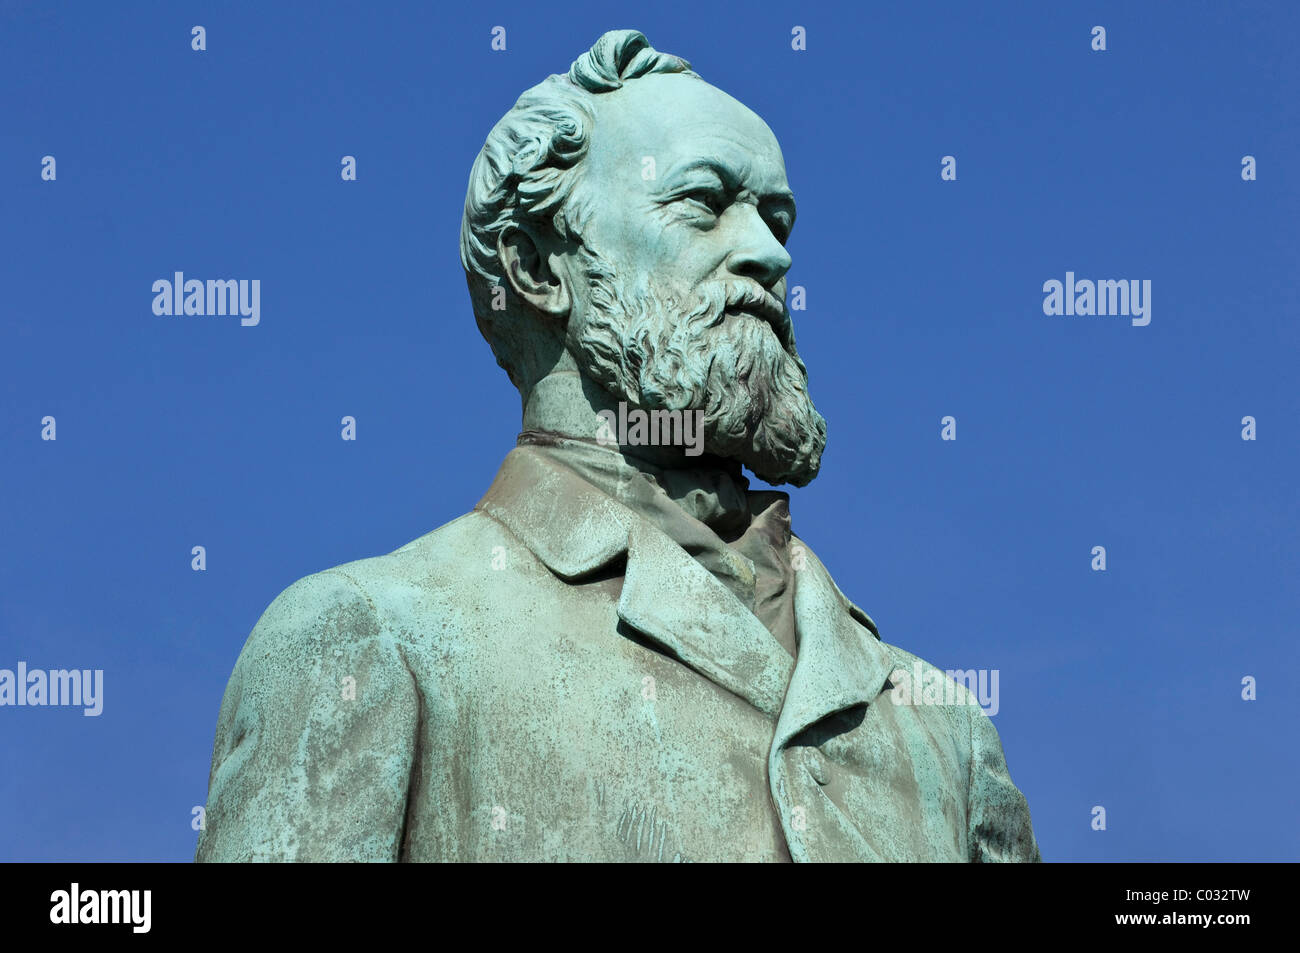 Statue of Alfred Krupp, industrialist and inventor, Essen, North Rhine-Westphalia, Germany, Europe - Stock Image